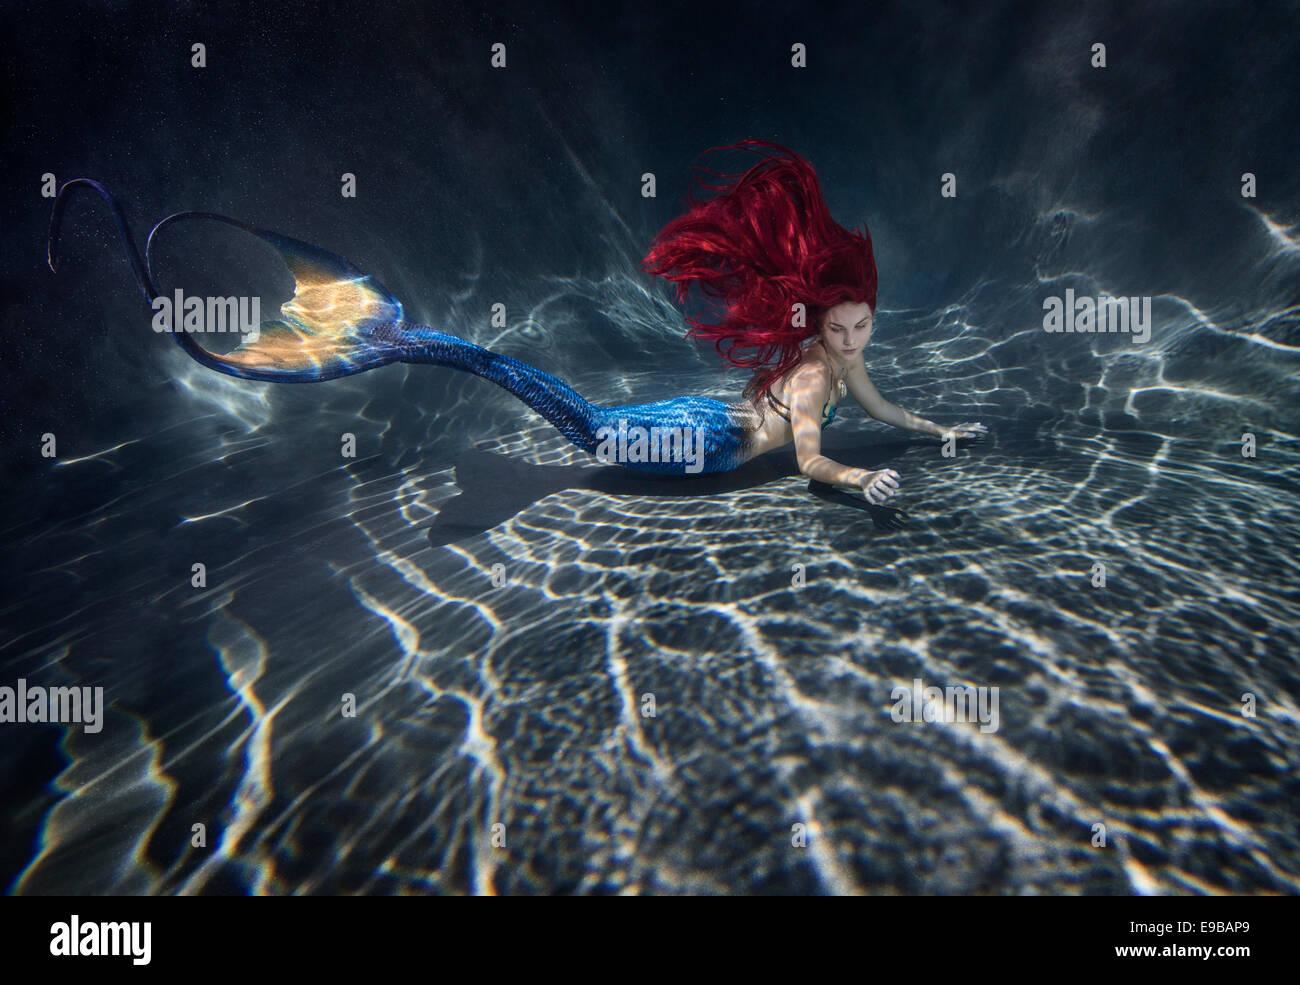 Redhead Mermaid Swimming In A Pool In Virginia Beach Virginia Stock Photo Royalty Free Image